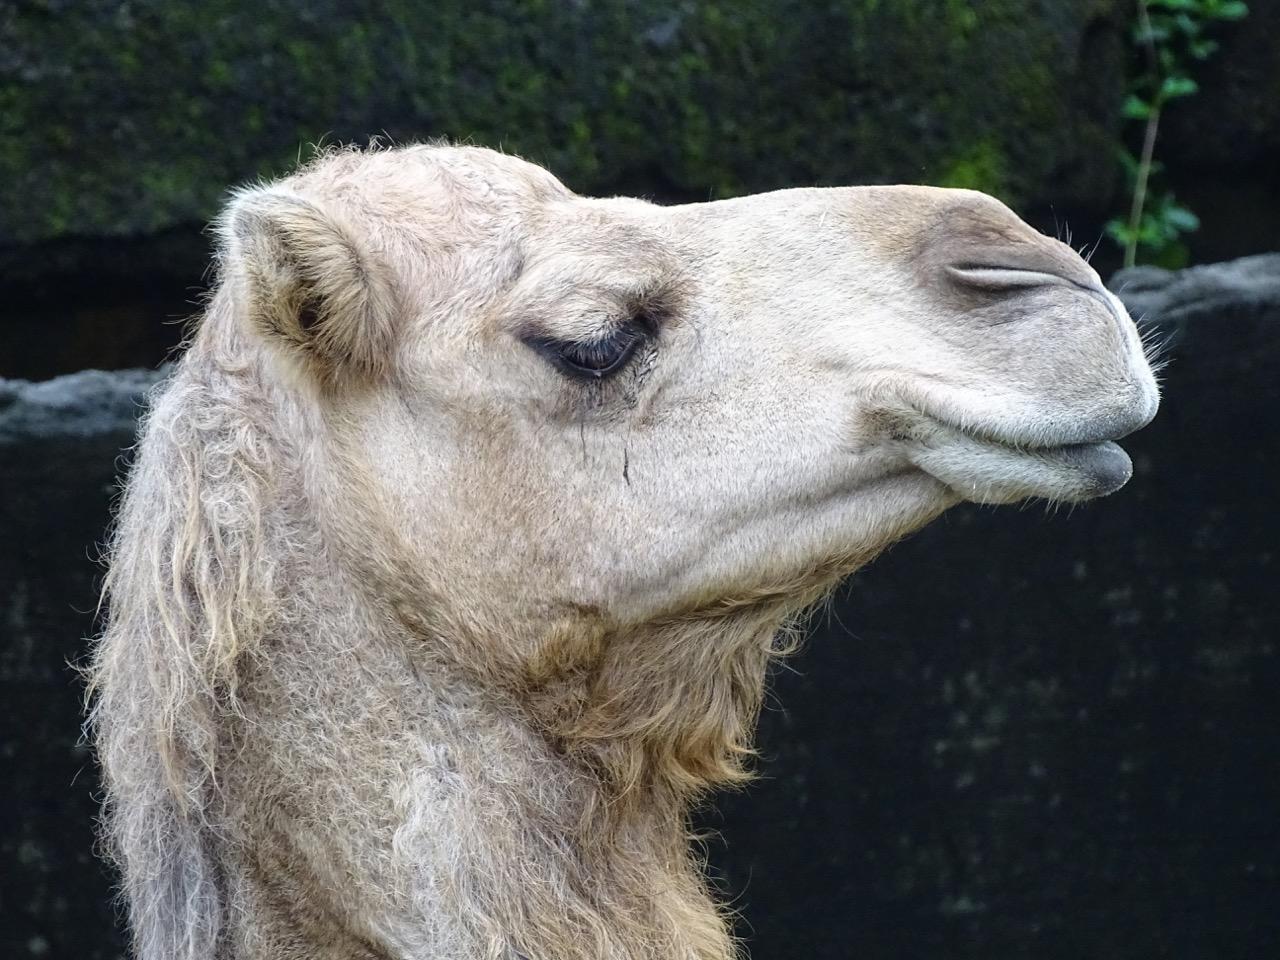 Camel at Taipei Zoo